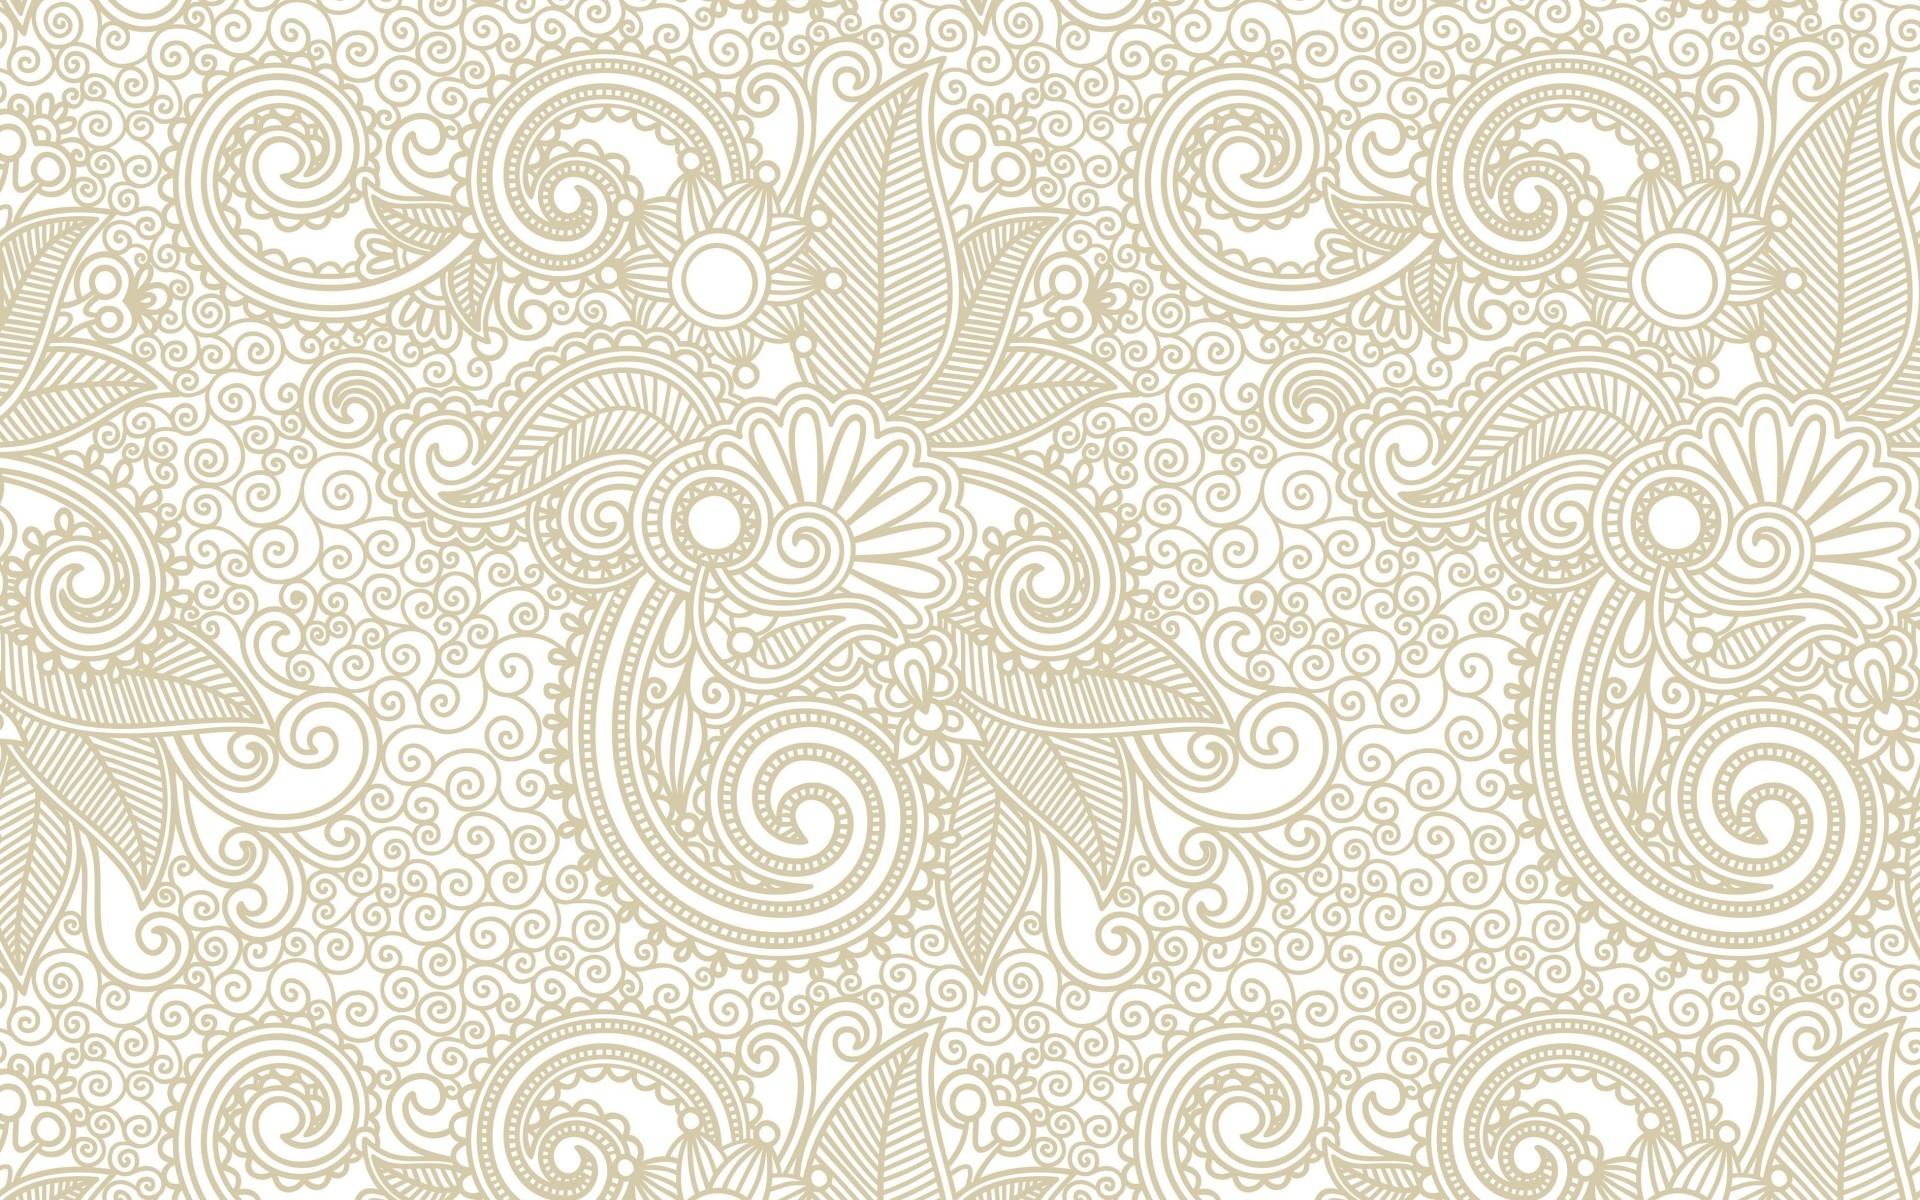 Wallpaper 1920x1200 Px Abstract Art Artistic Flowers Pattern